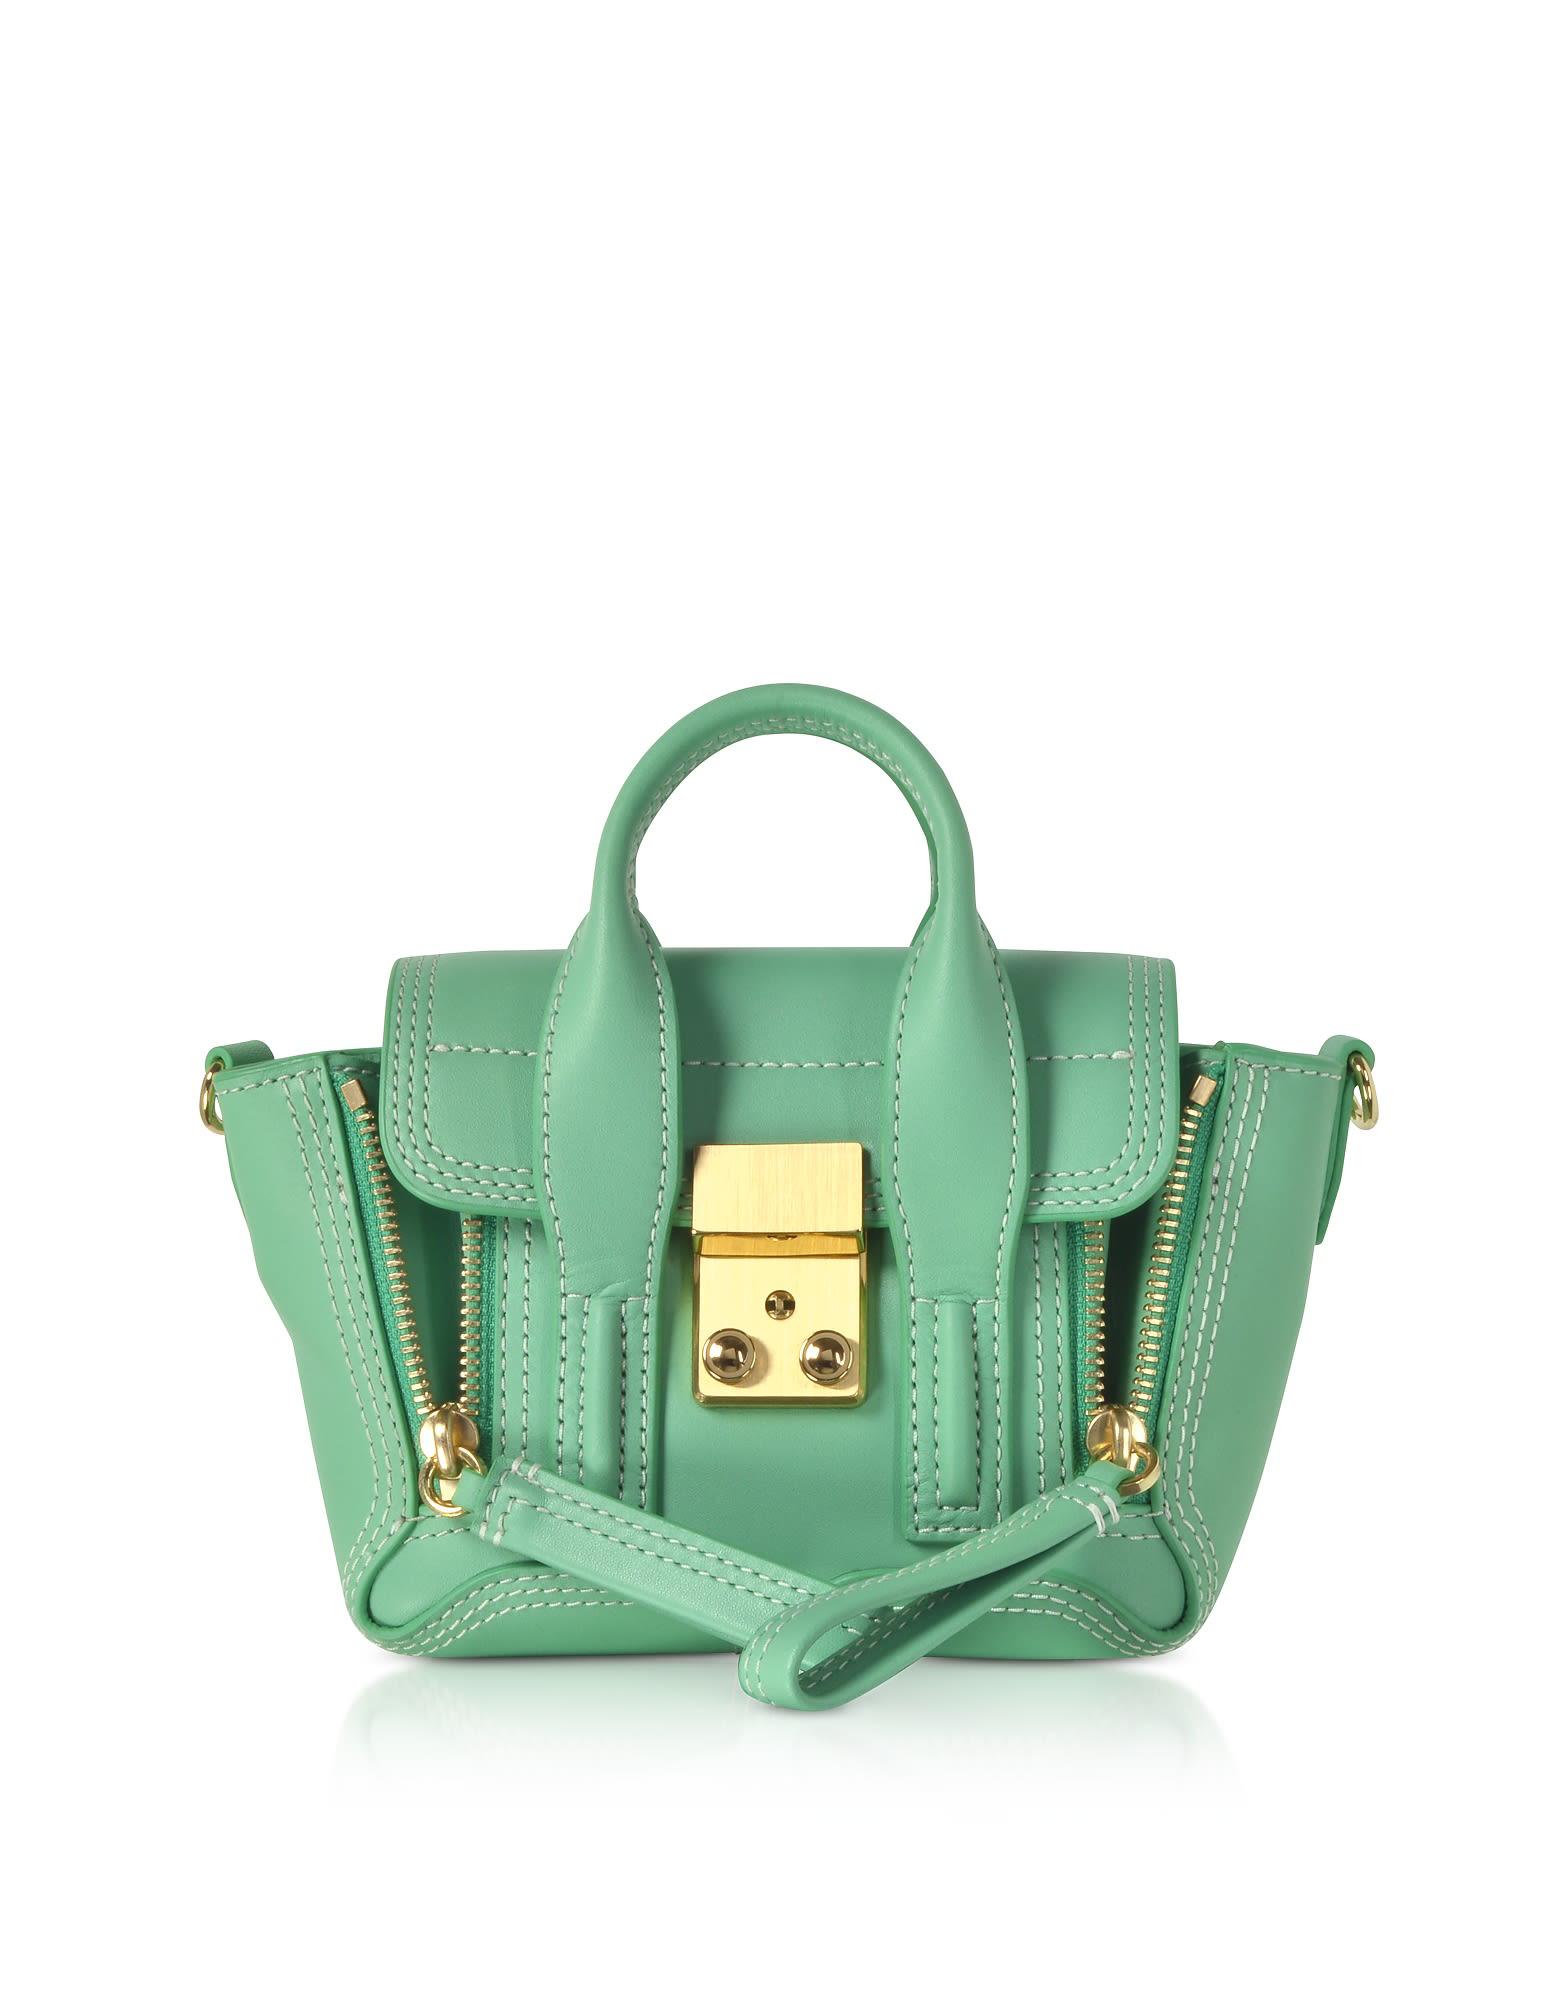 3.1 Phillip Lim Pashli Nano Satchel Bag In Basic